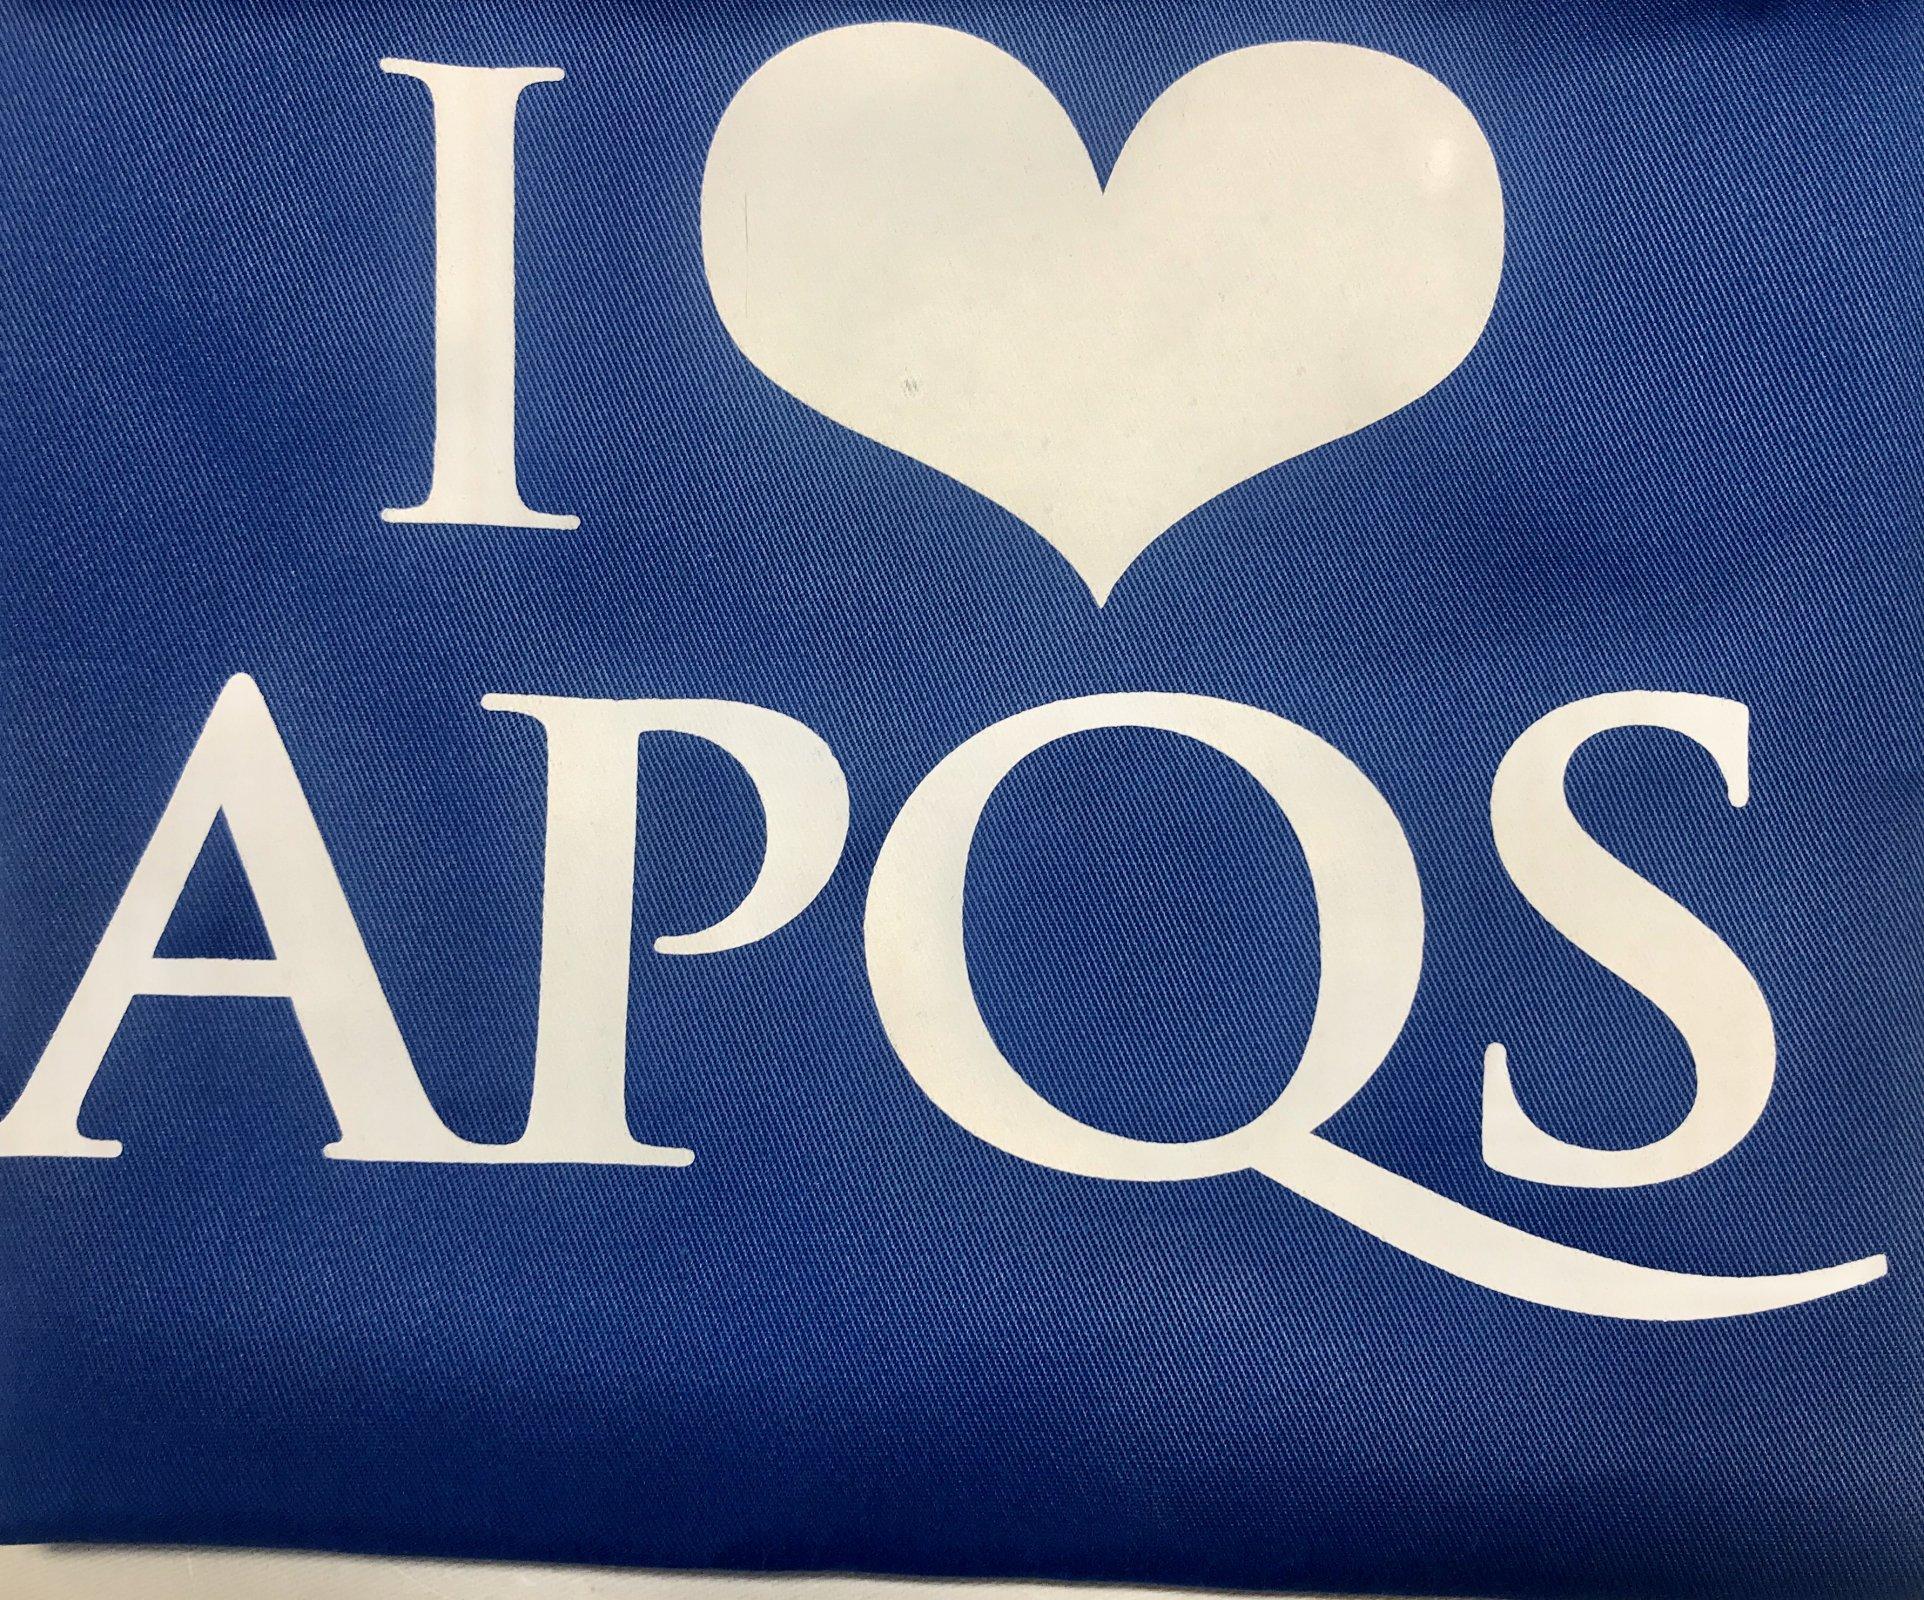 APQS Apron